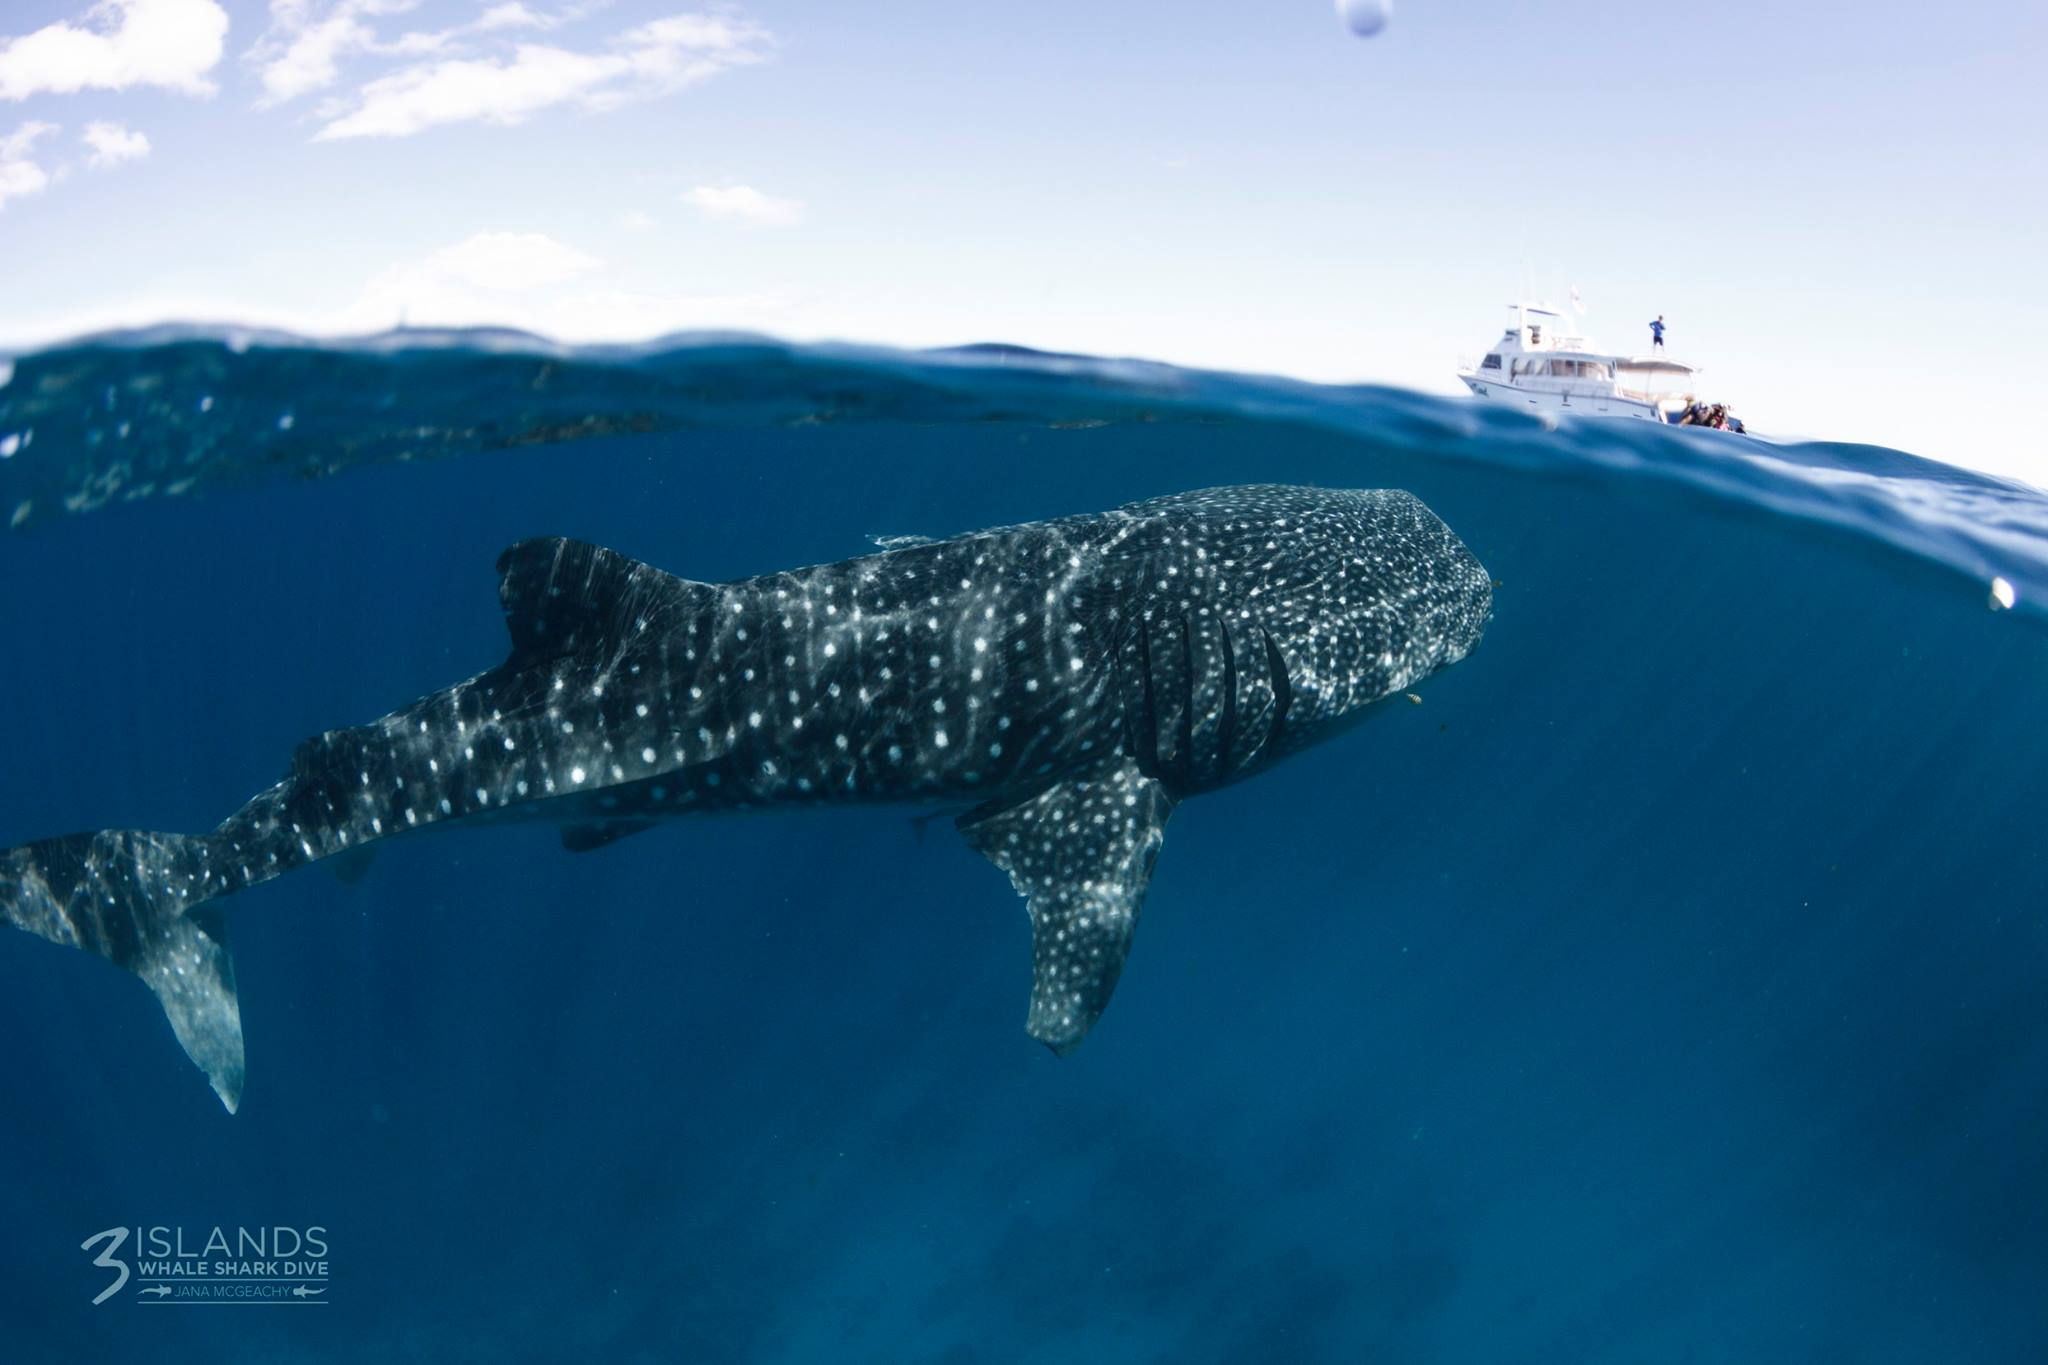 Whale shark diving - Western Australia 4